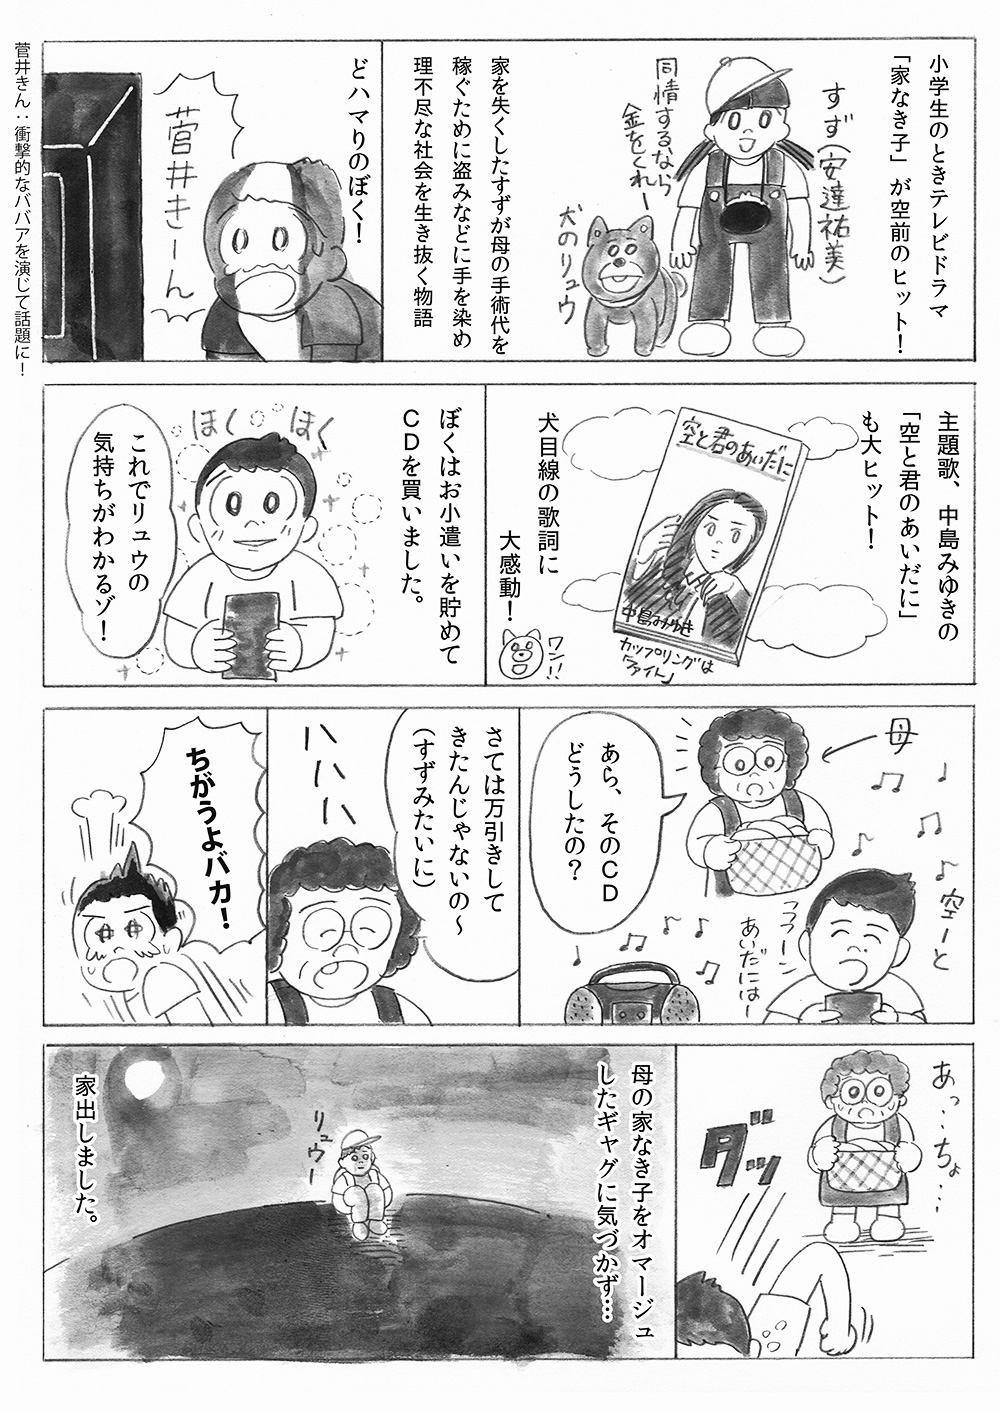 jimbo_satoshi-002